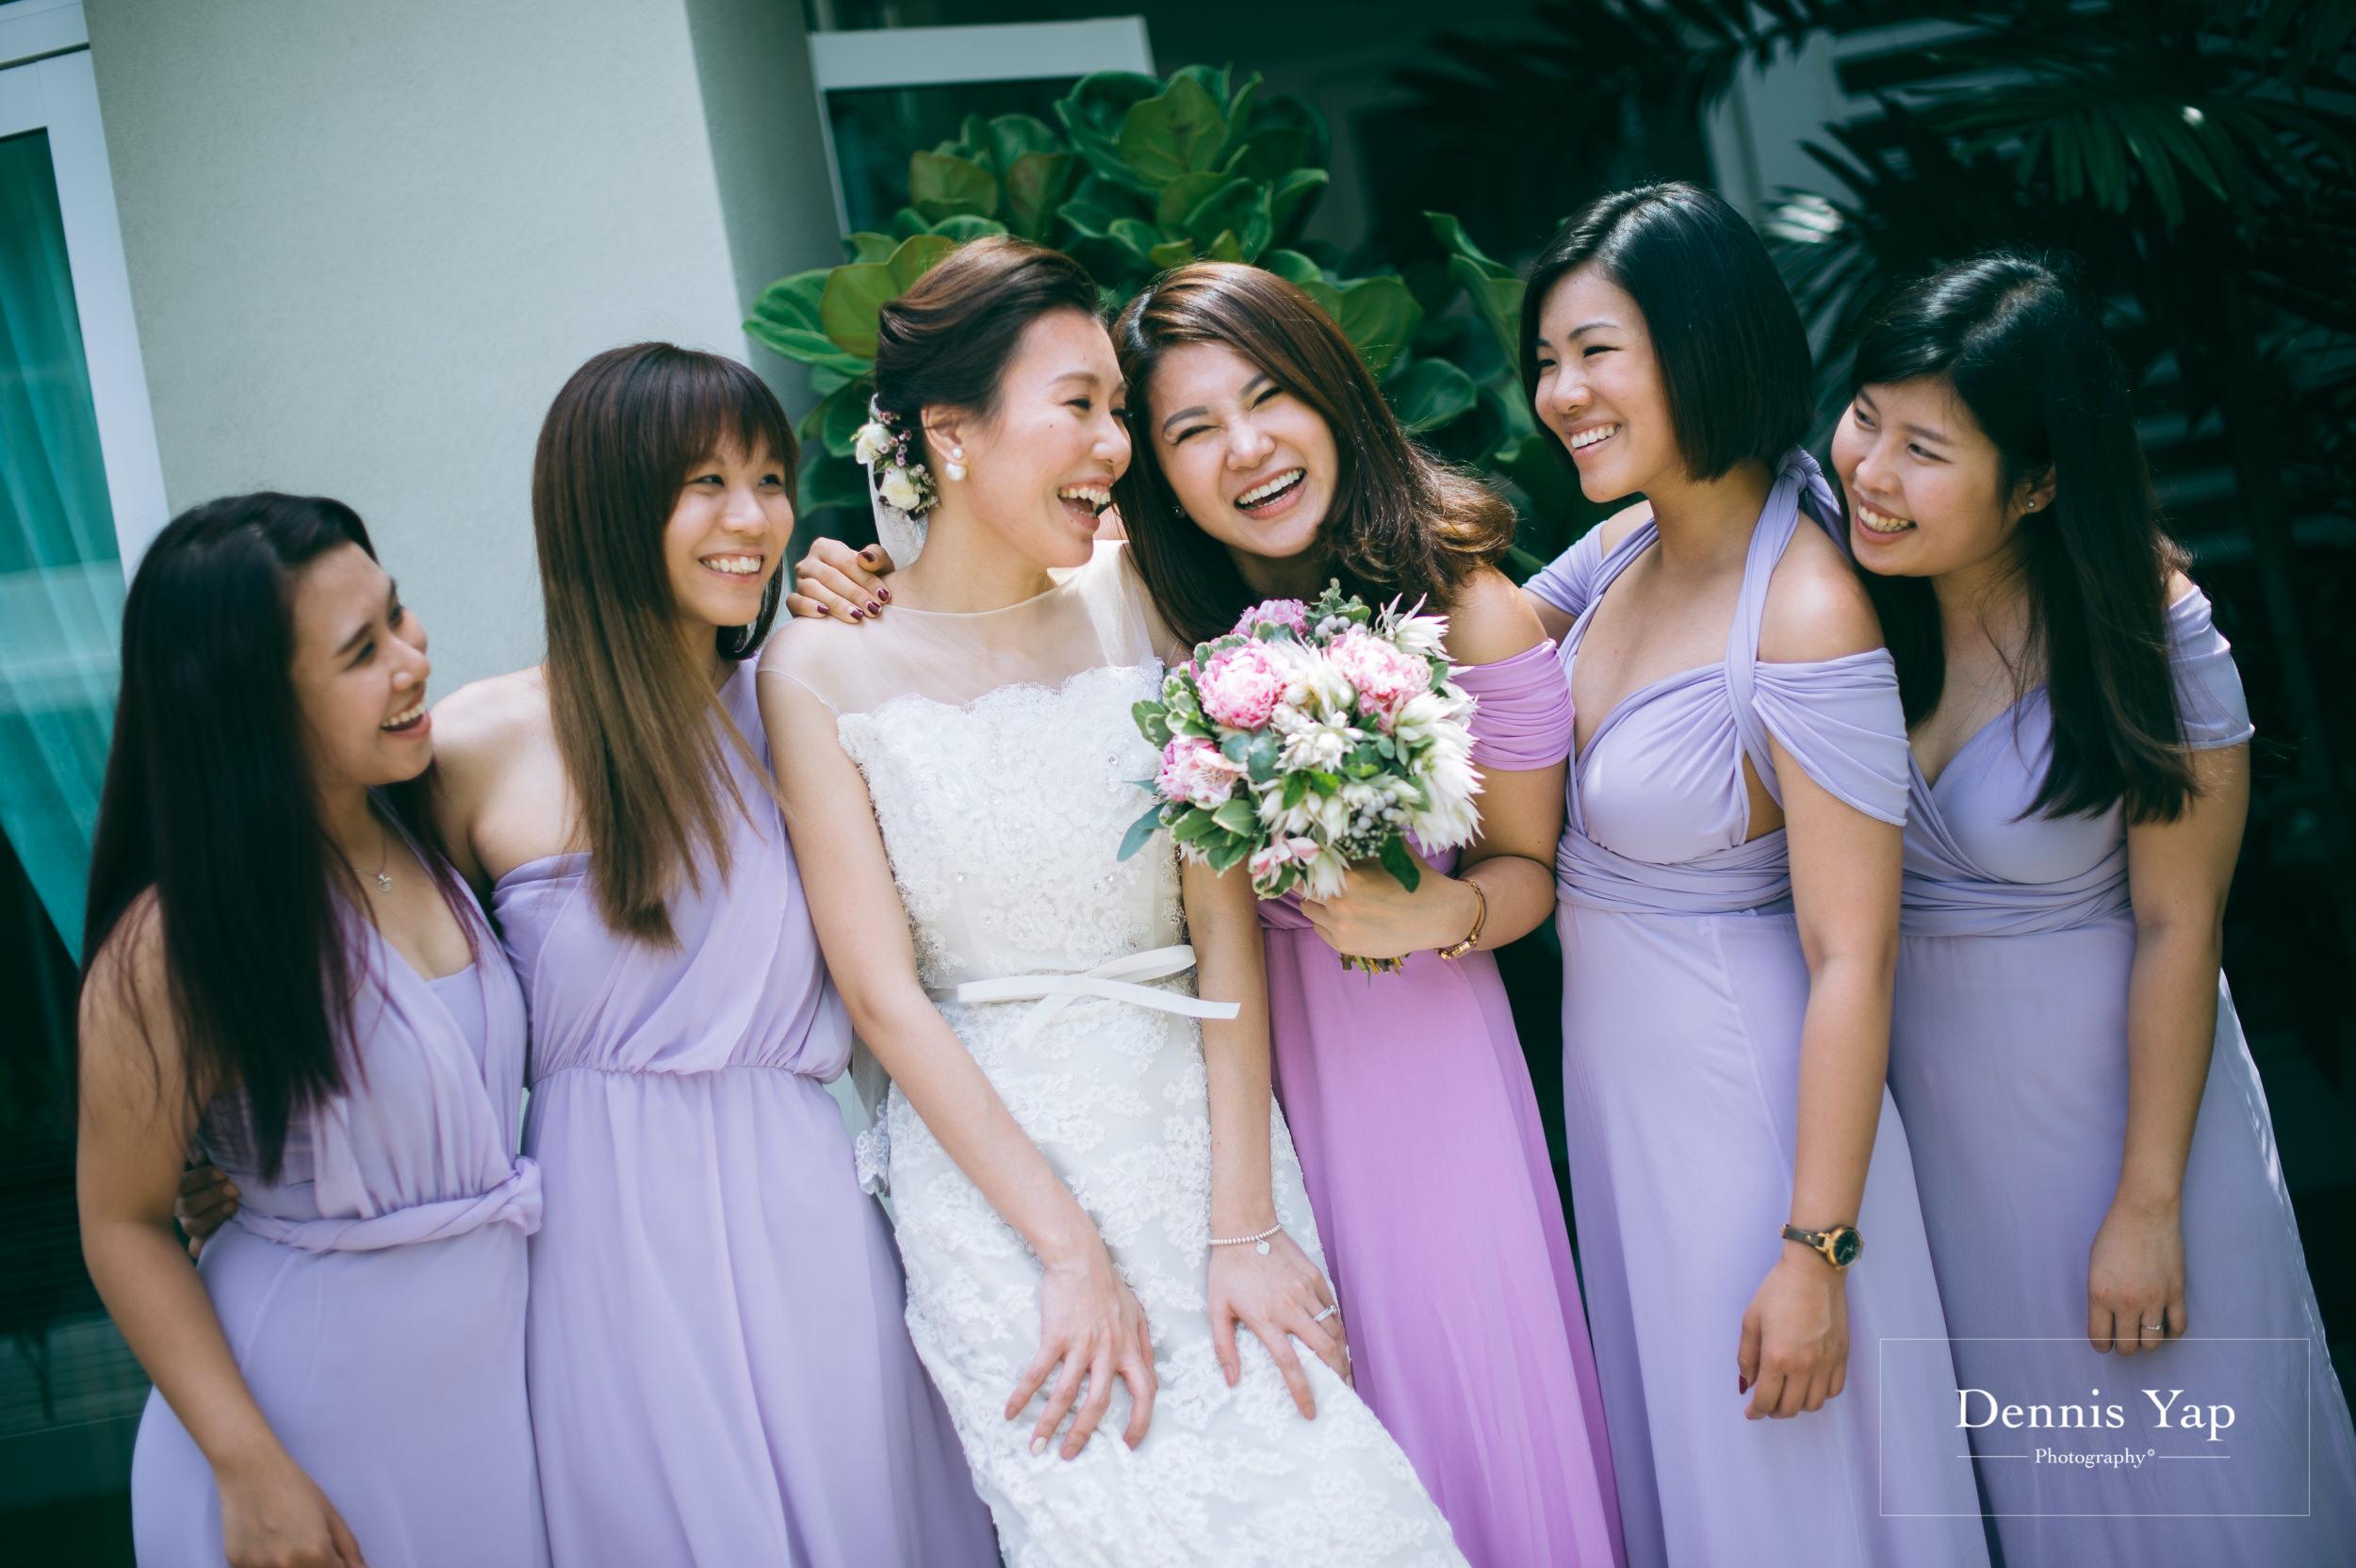 danny sherine wedding day group photo dennis yap photography usj heights malaysia top wedding photographer-19.jpg